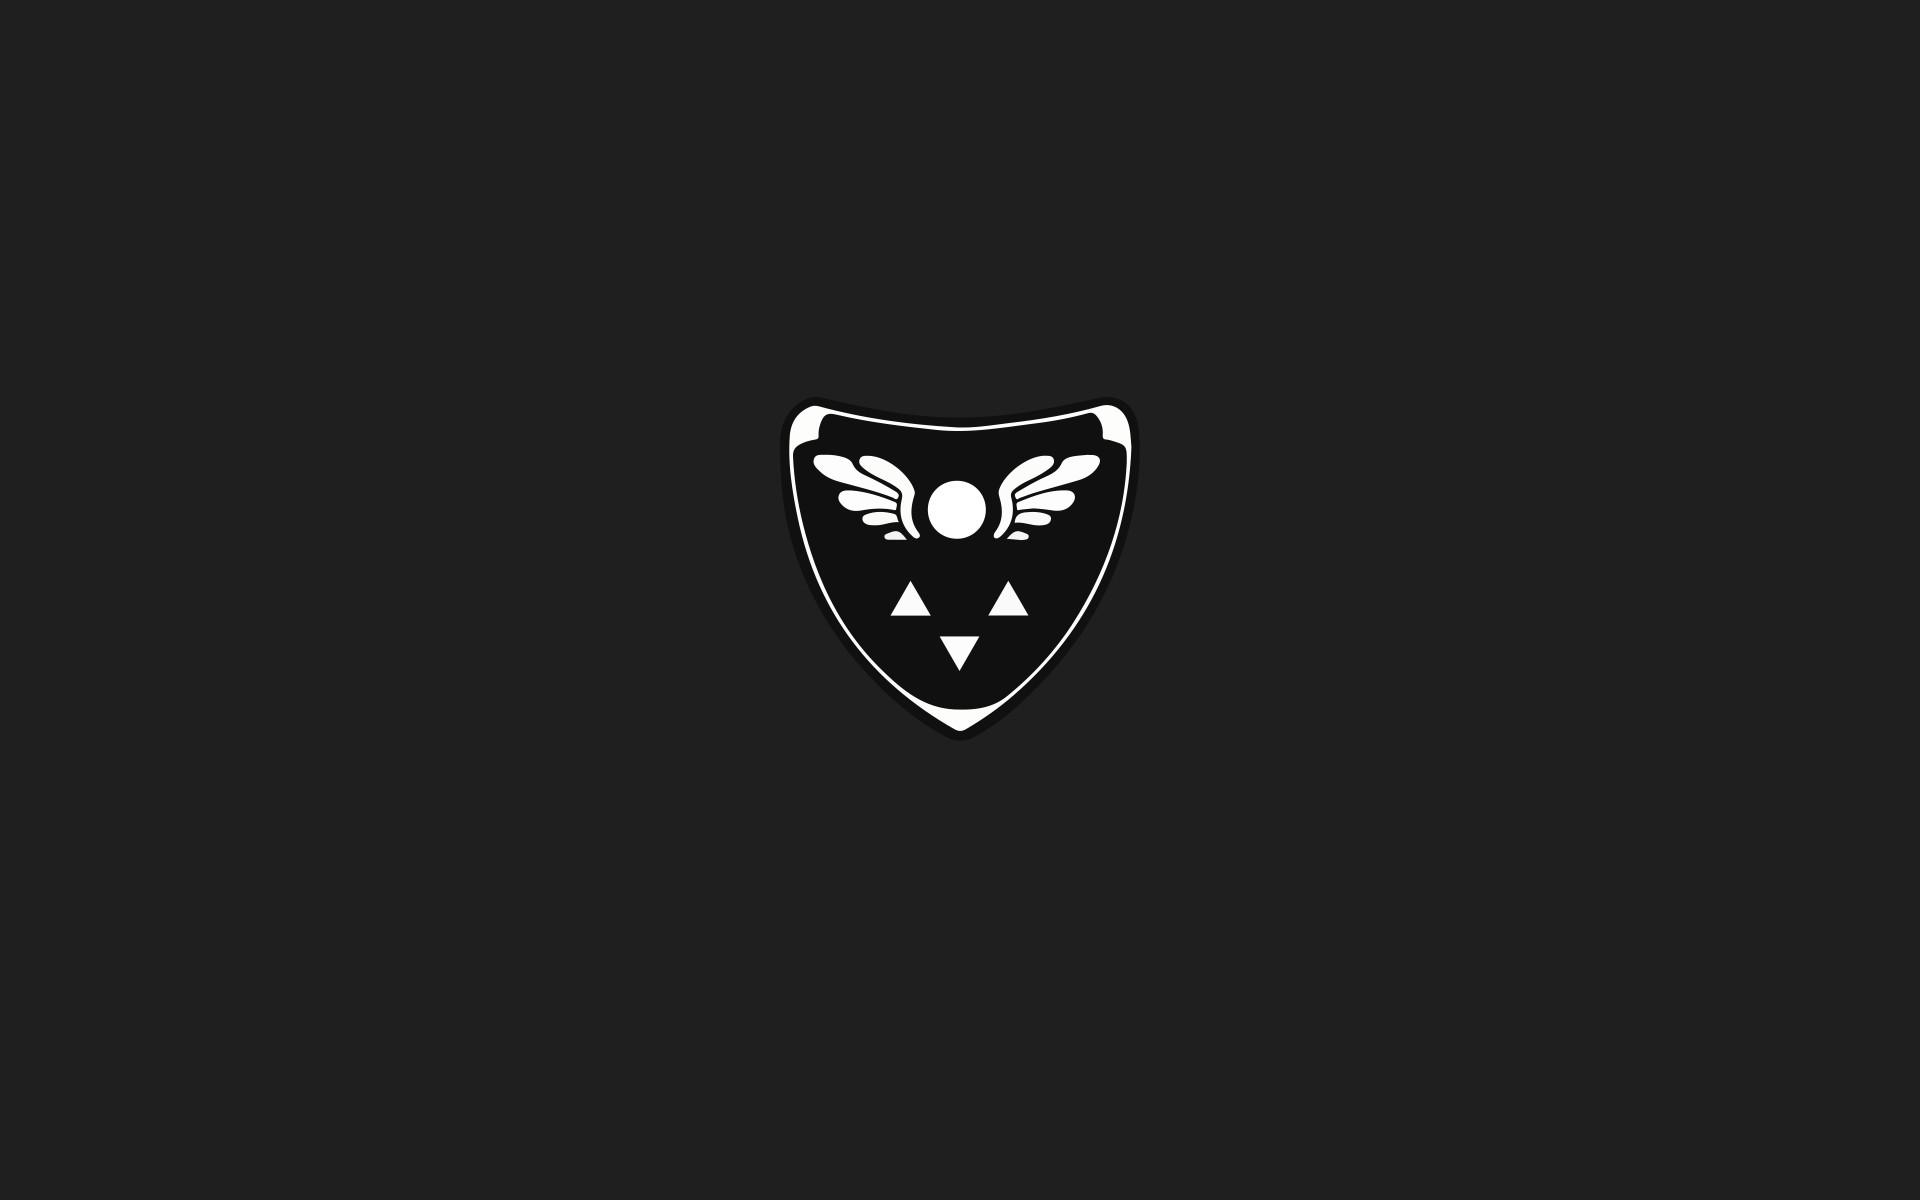 … Delta Rune Wallpaper – Dark by Eonity